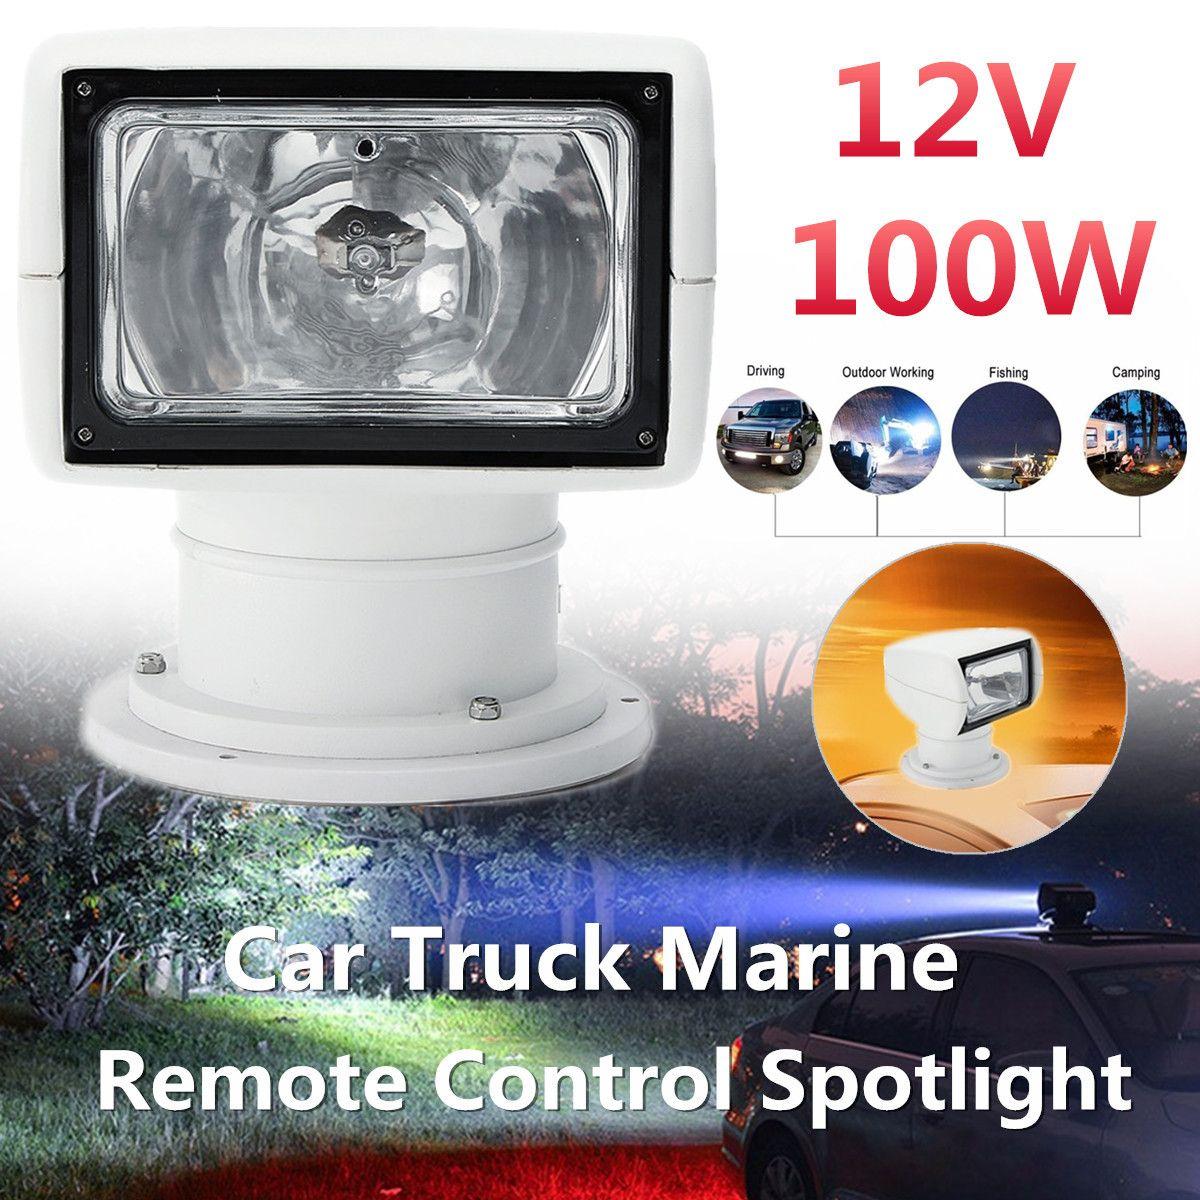 Boat Truck Car Spotlight 12V 100W 2500LM 3200K Marine Searchlight Light Bulb Remote Control PC+Aluminum Multi-angled White